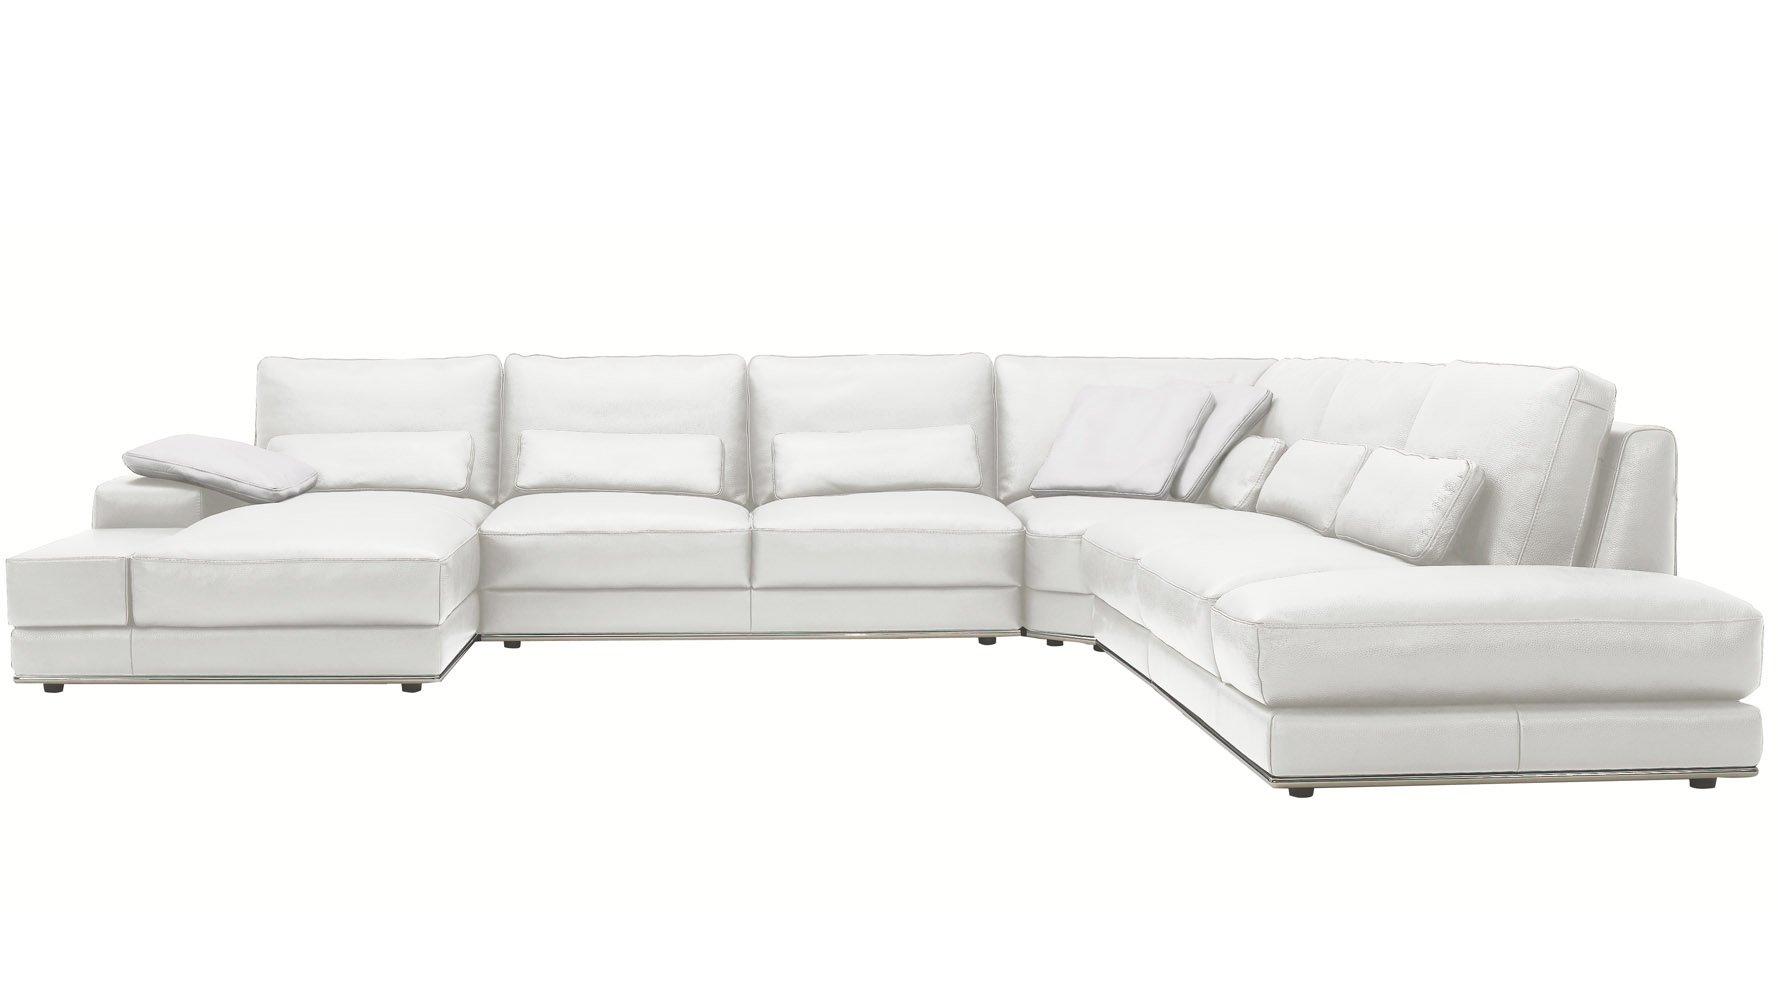 Modern 3 piece white leather nolan sectional sofa zuri for 3 piece leather sectional sofa with chaise